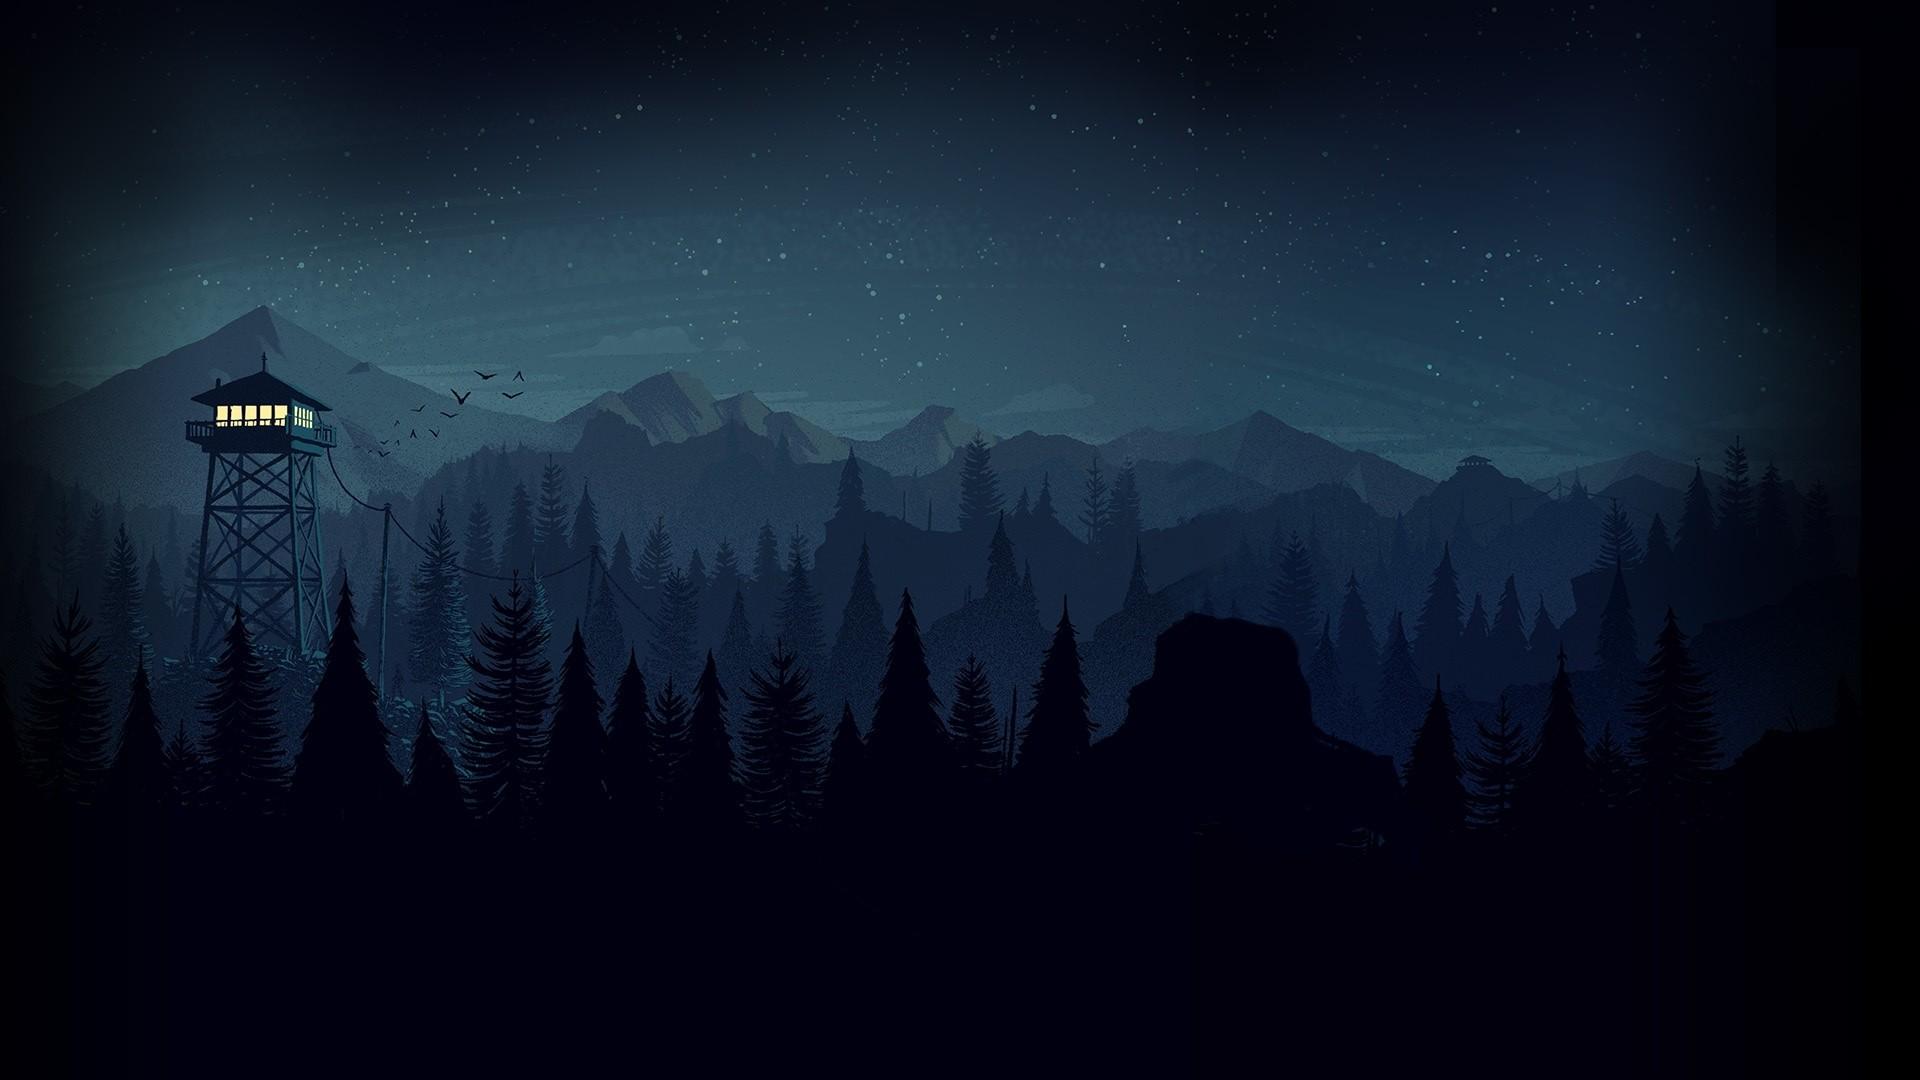 Dark Minimalist Free Wallpaper and Background